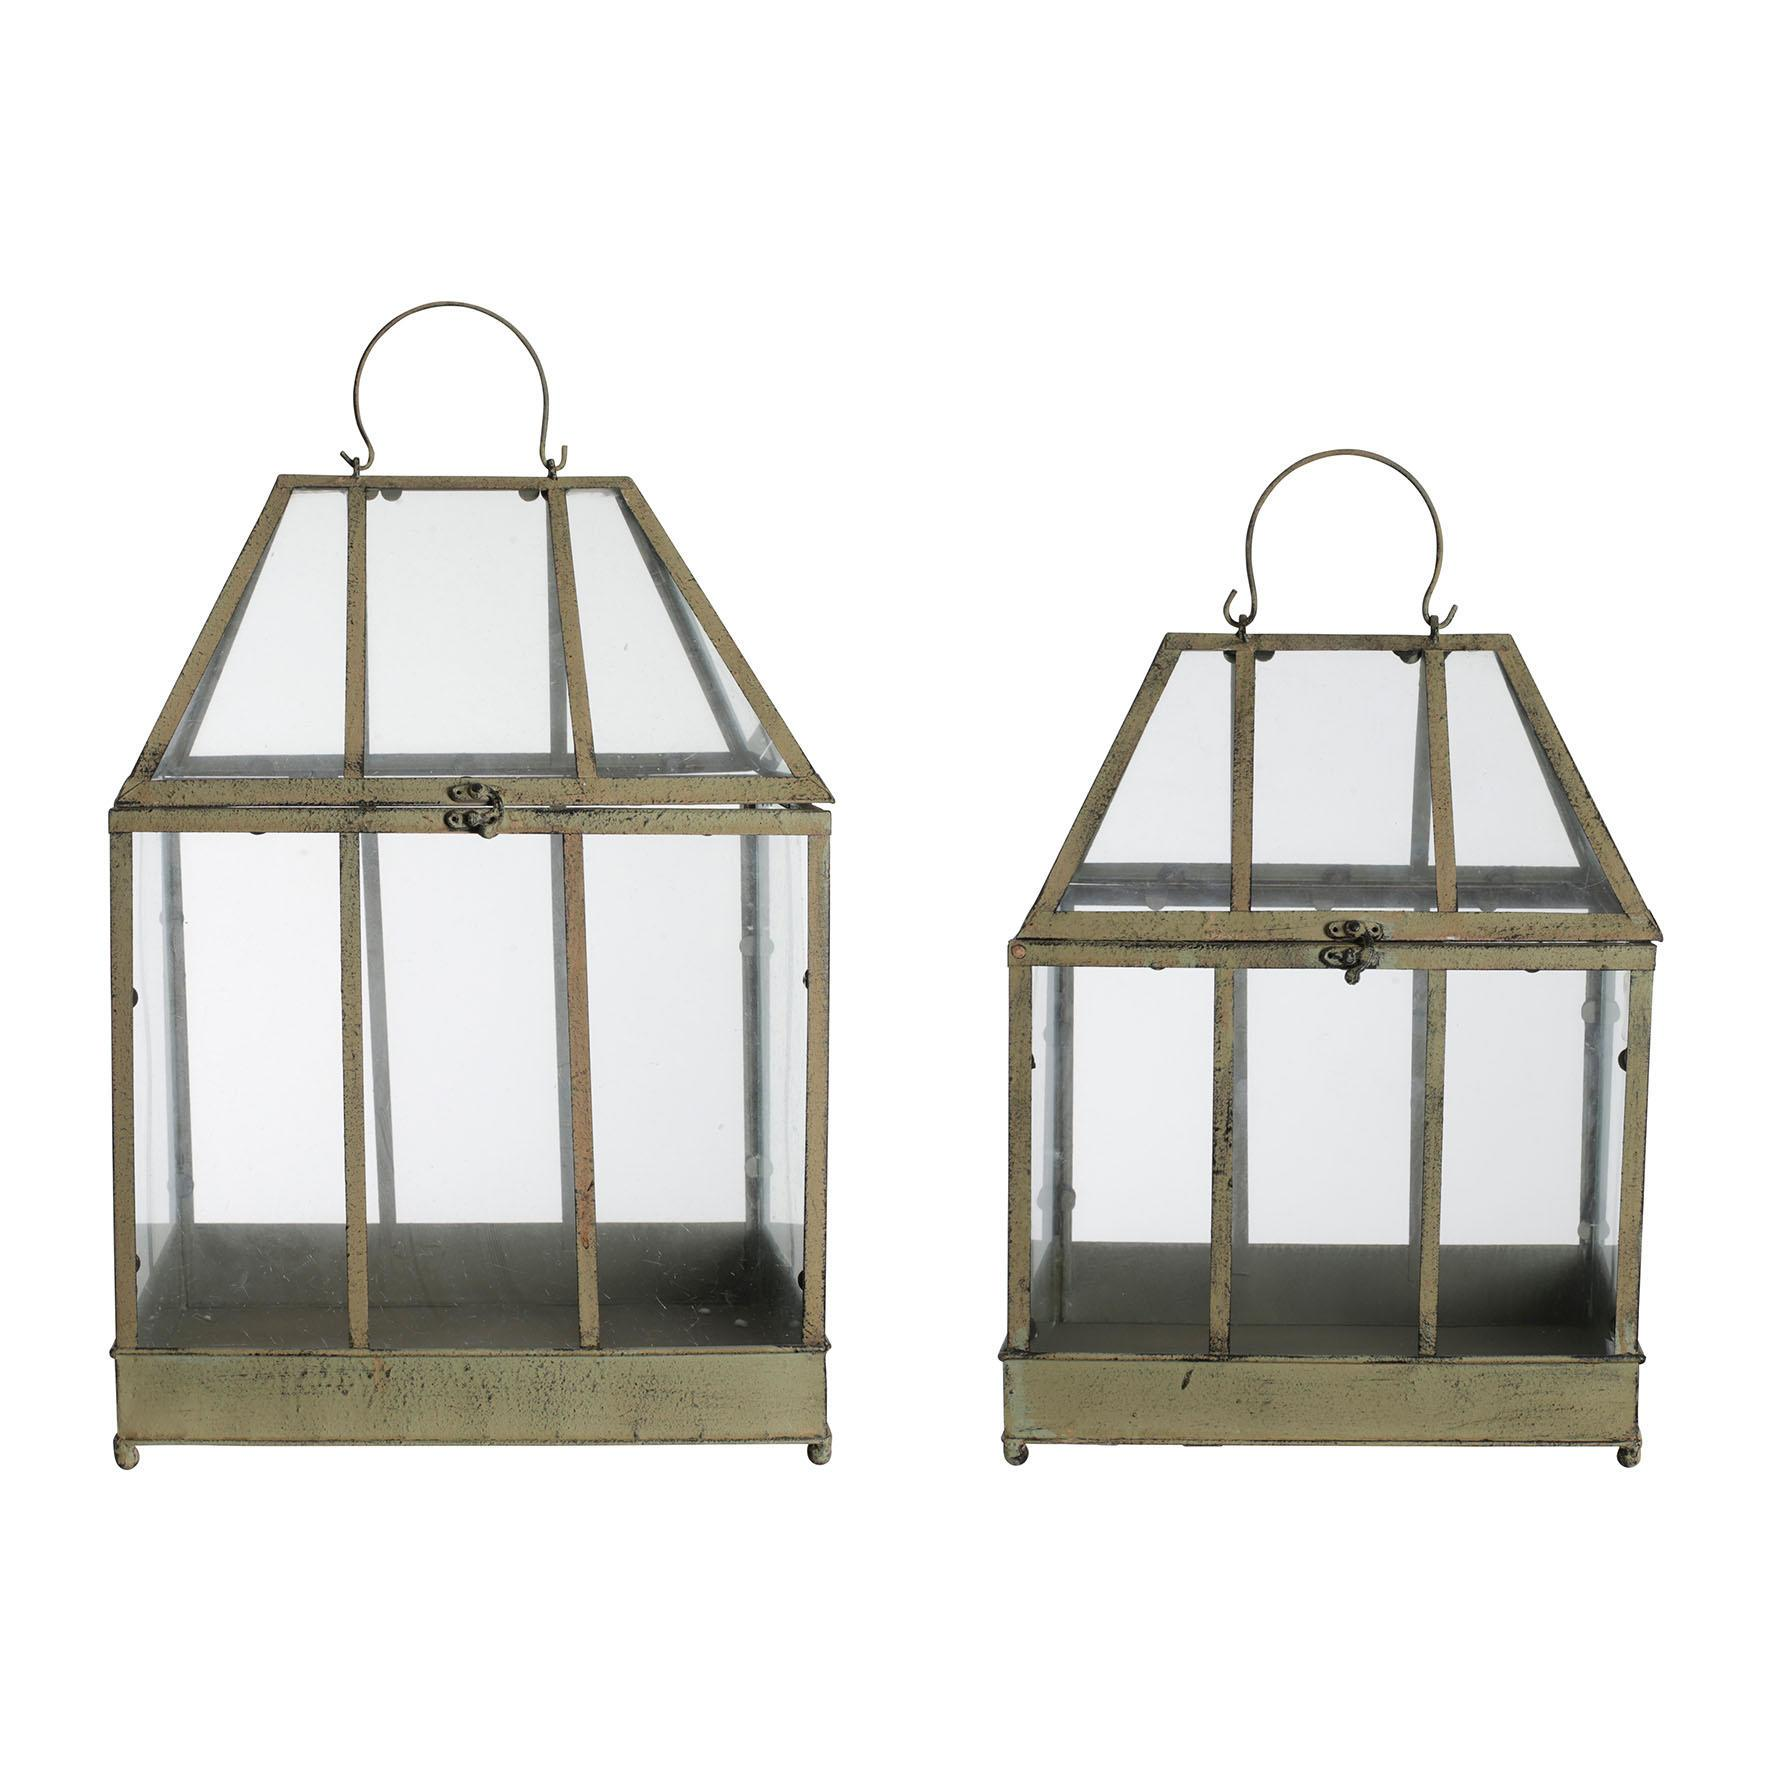 CÔTÉ TABLE Zahradní skleník Jardinet H53/46 Menší, multi barva, sklo, kov